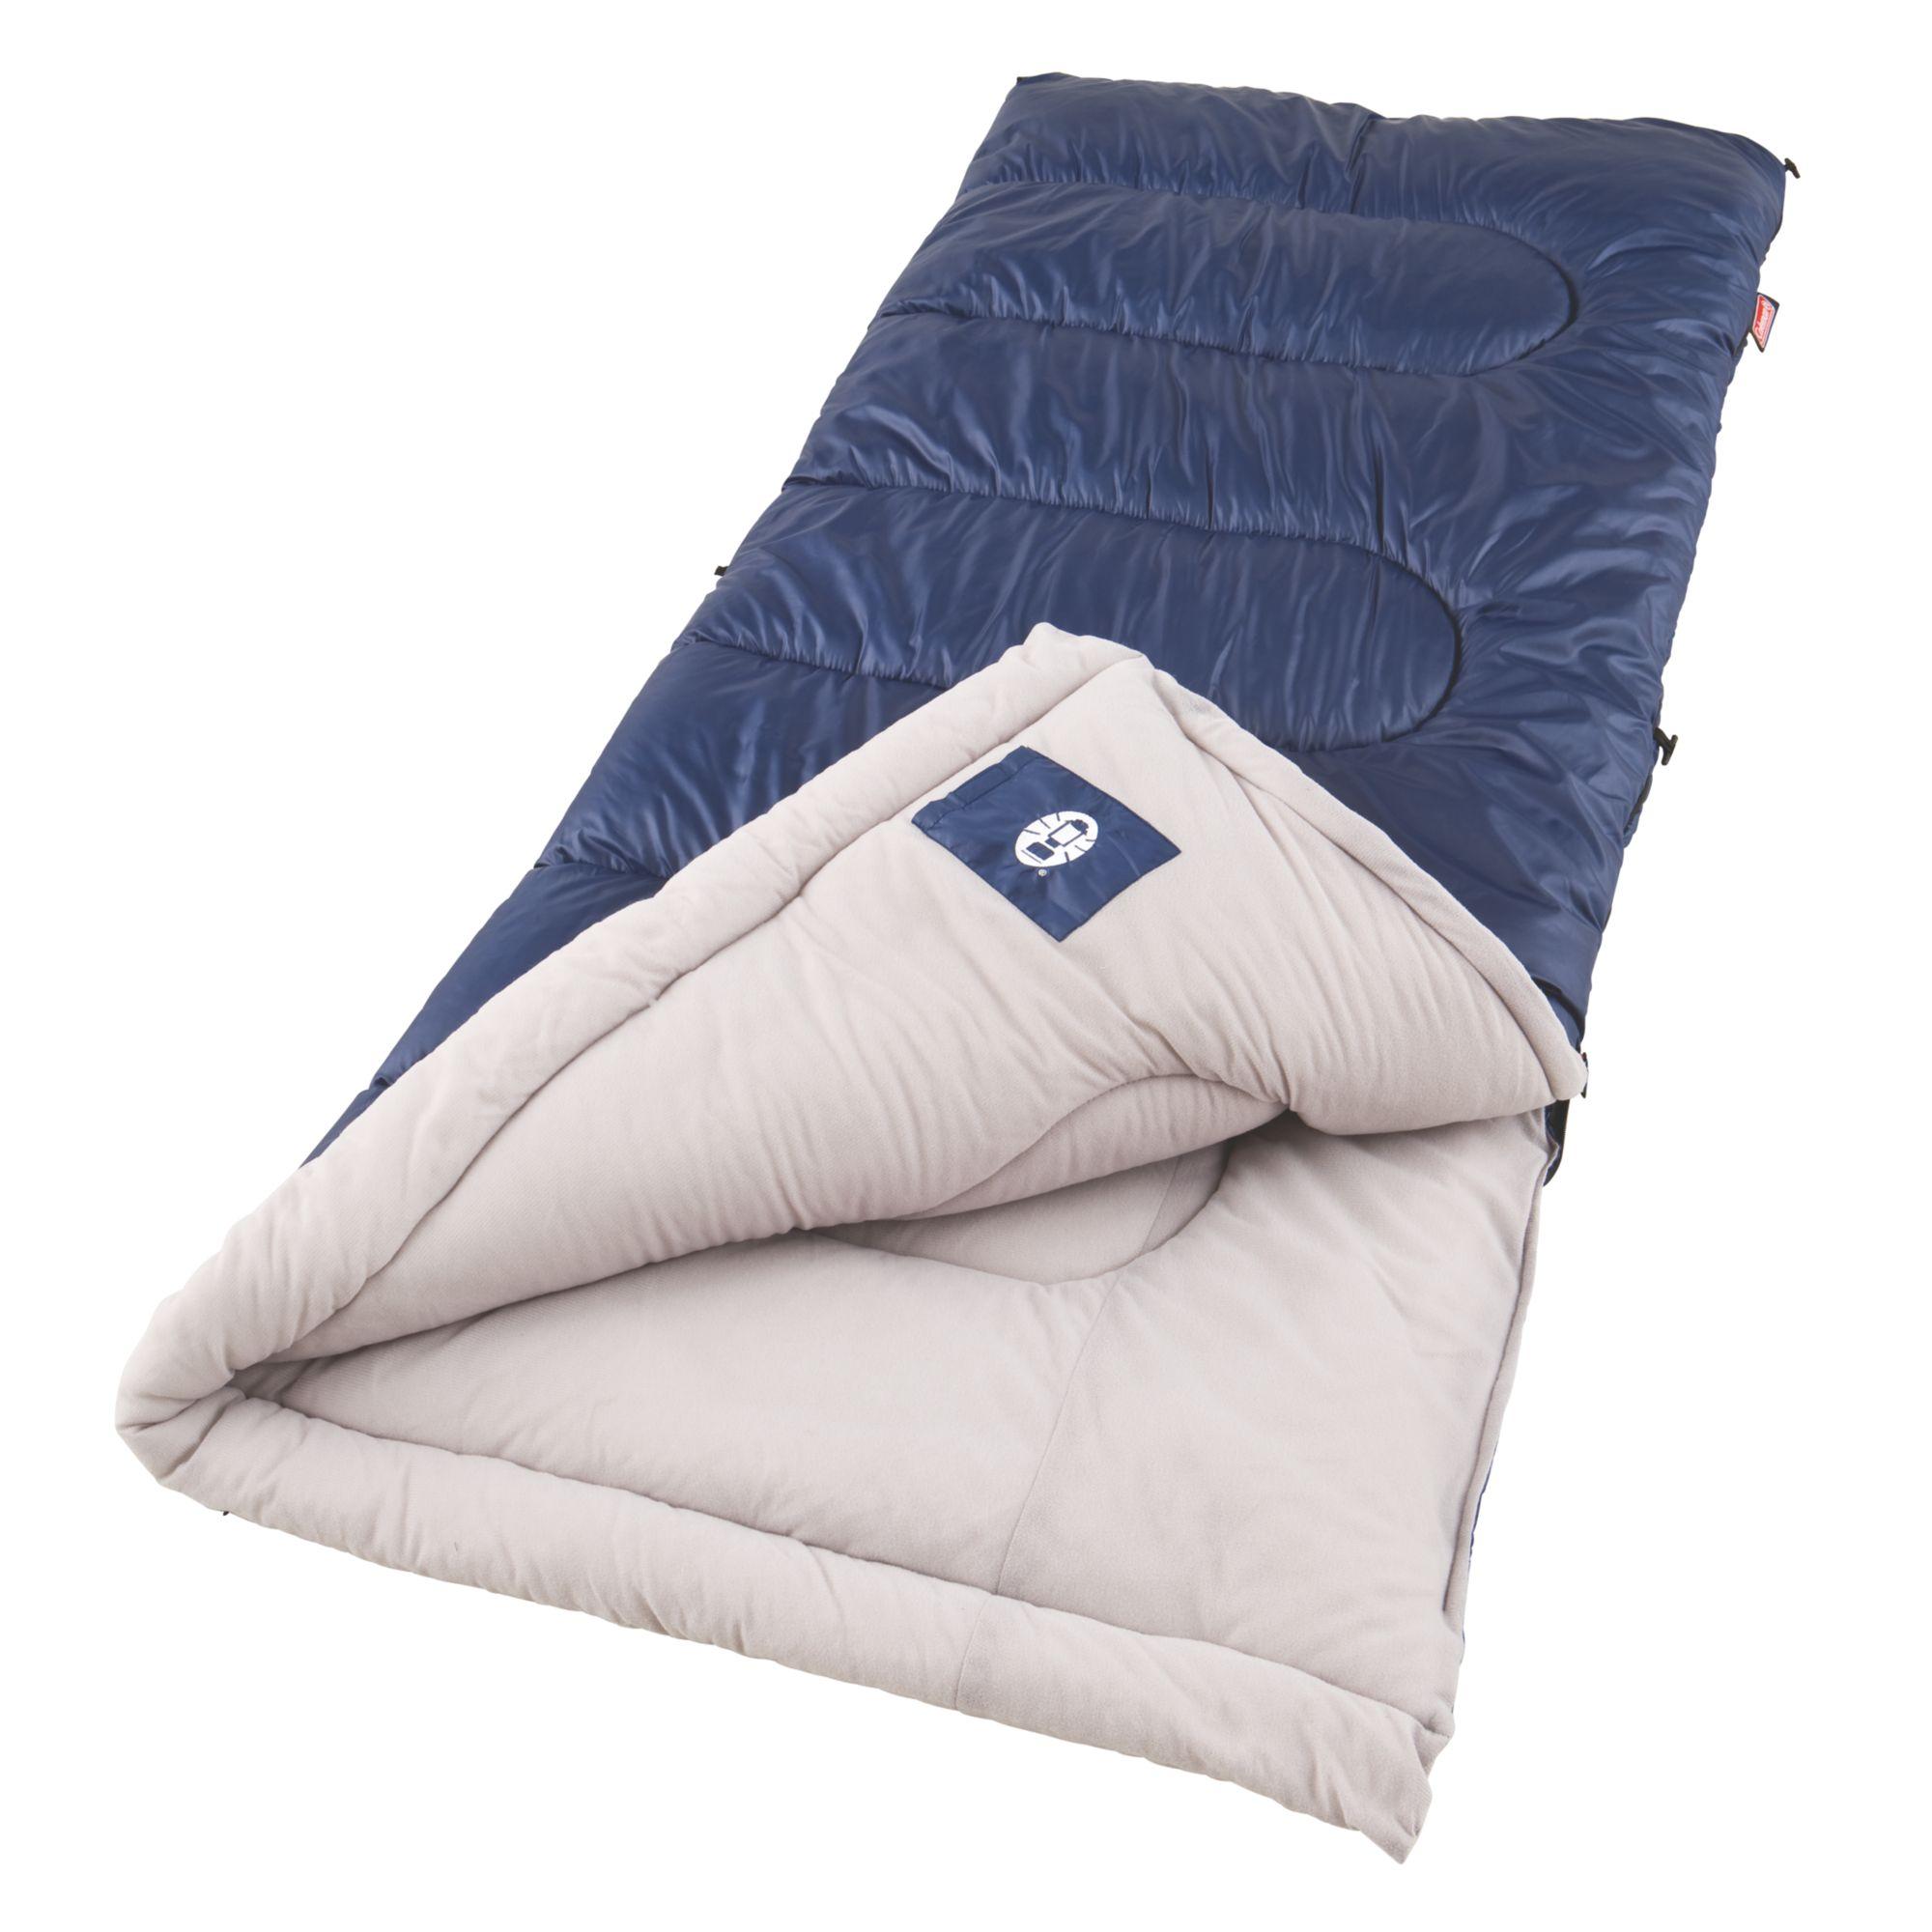 BrazosTM Cold Weather Sleeping Bag